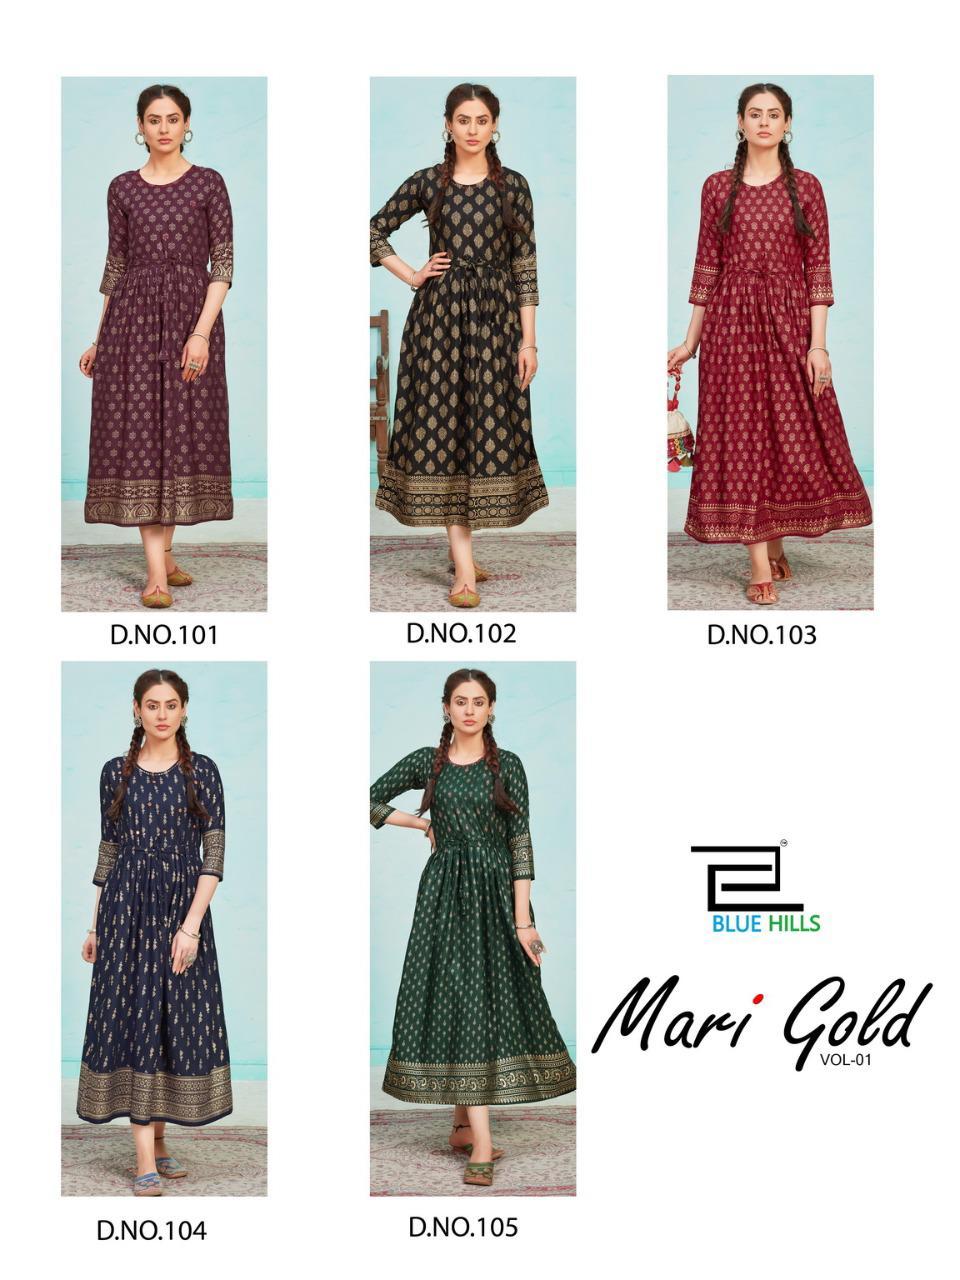 Blue Hills Mari Gold Vol 1 Kurti Wholesale Catalog 5 Pcs 8 - Blue Hills Mari Gold Vol 1 Kurti Wholesale Catalog 5 Pcs